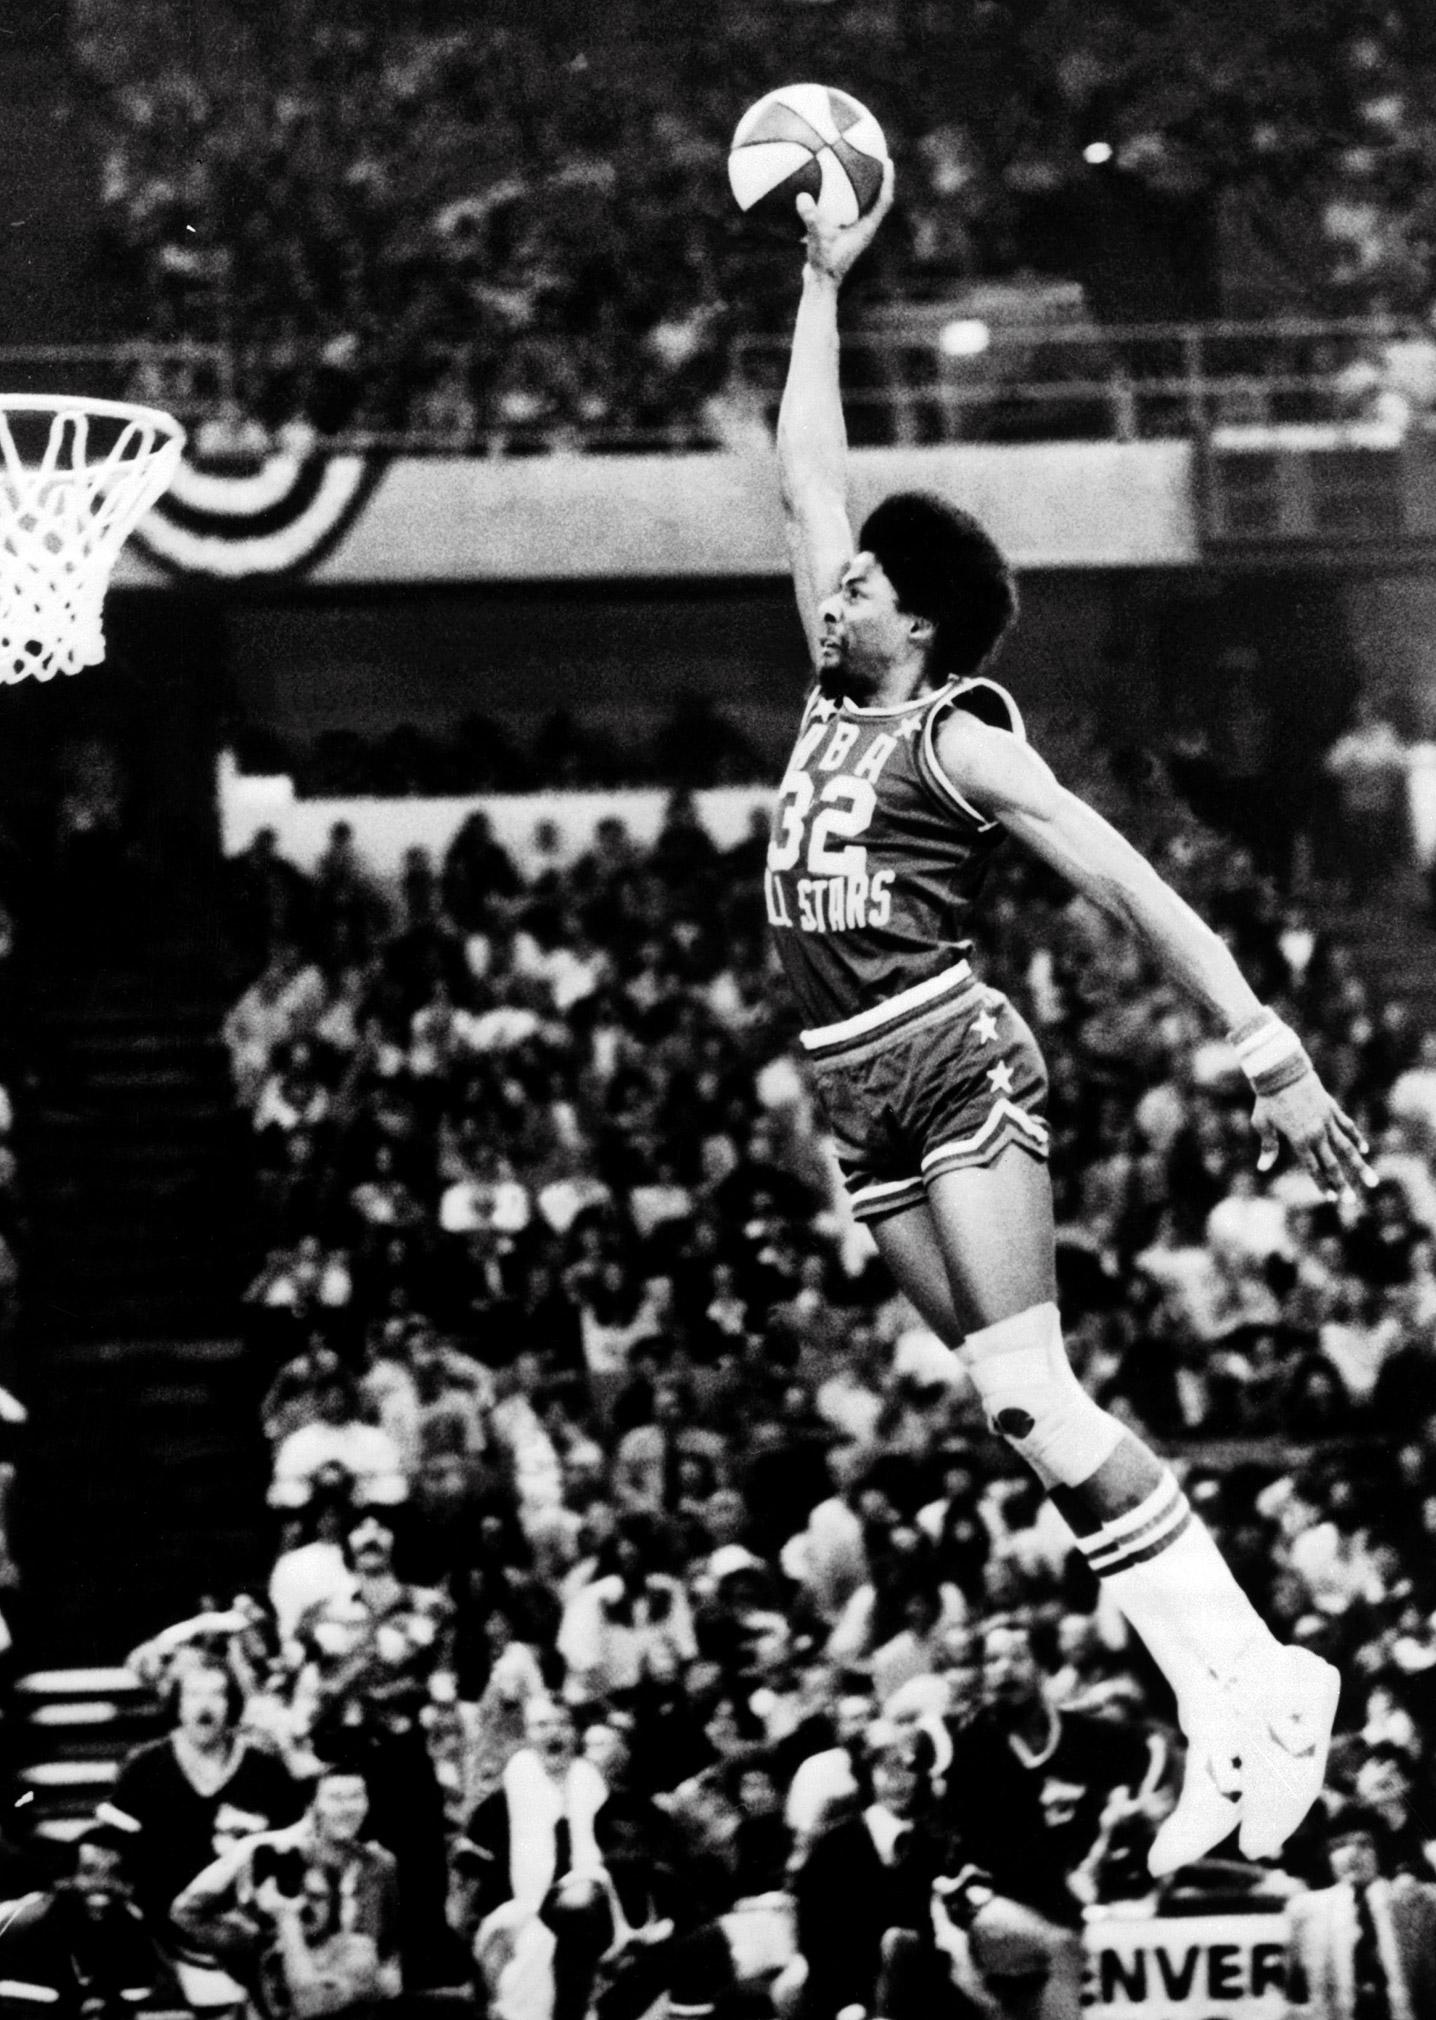 Dr j dunk contest 1976 cadillac